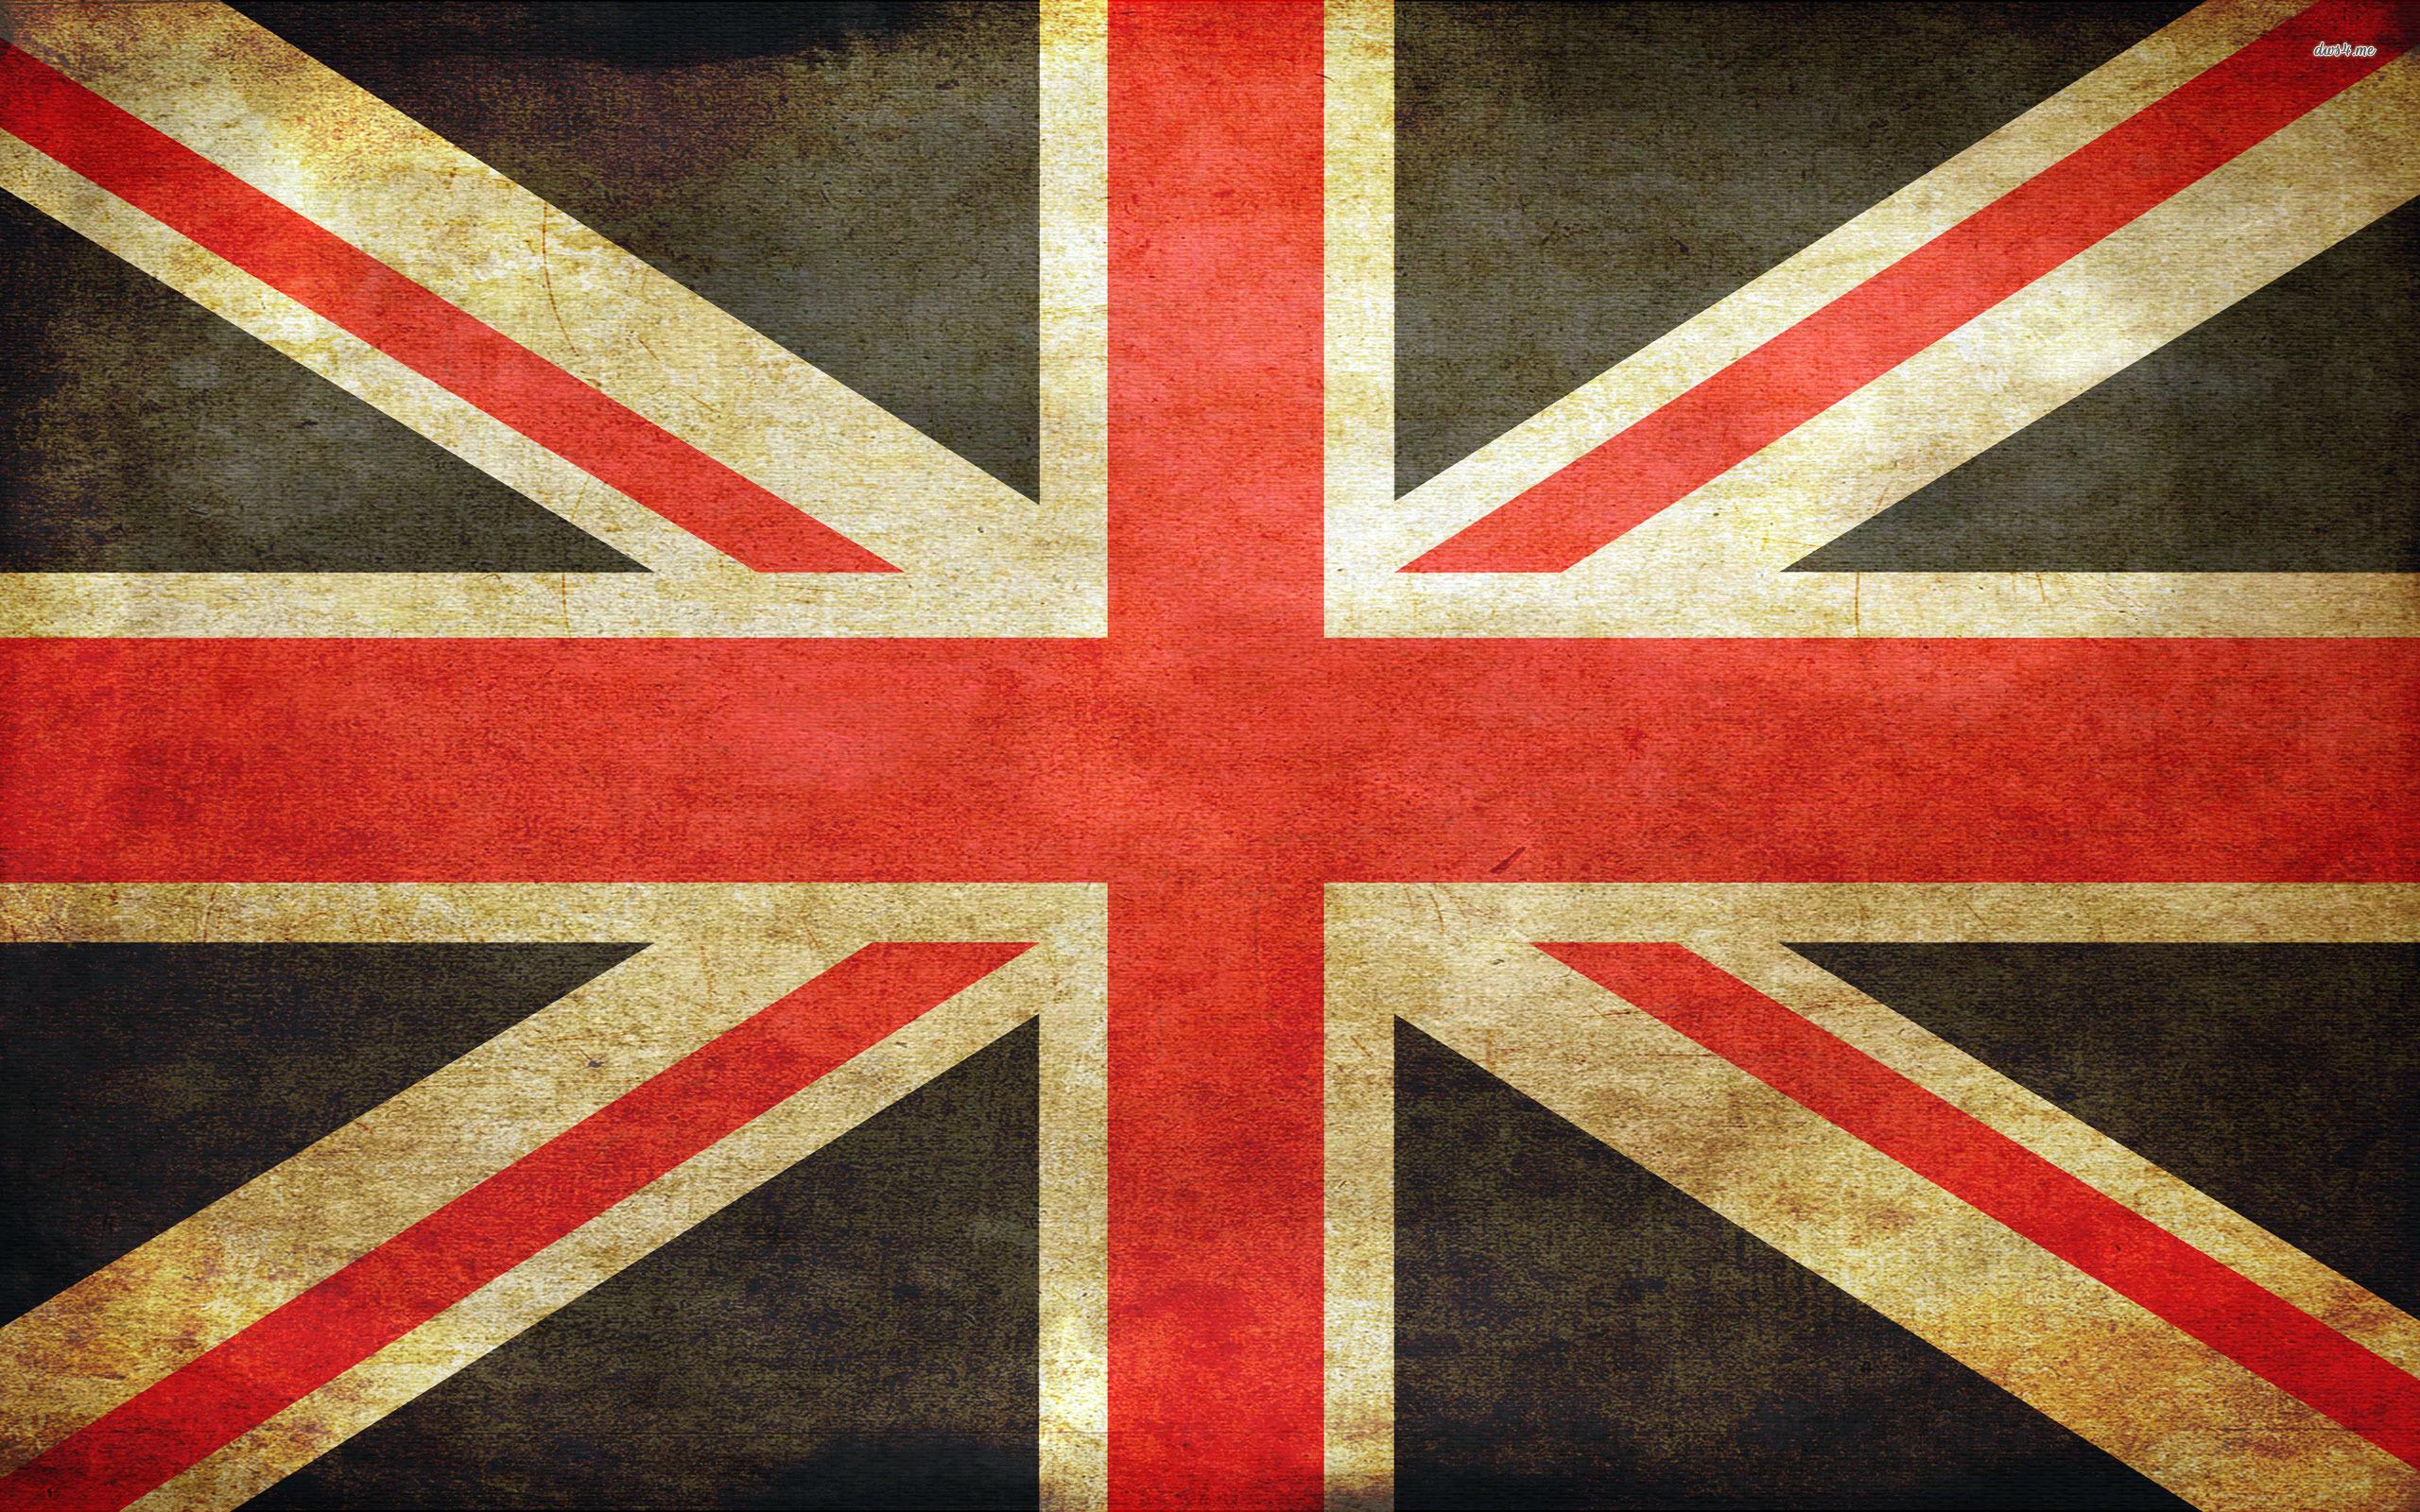 pictures united kingdom flag united kingdom flag united kingdom flag 2560x1600